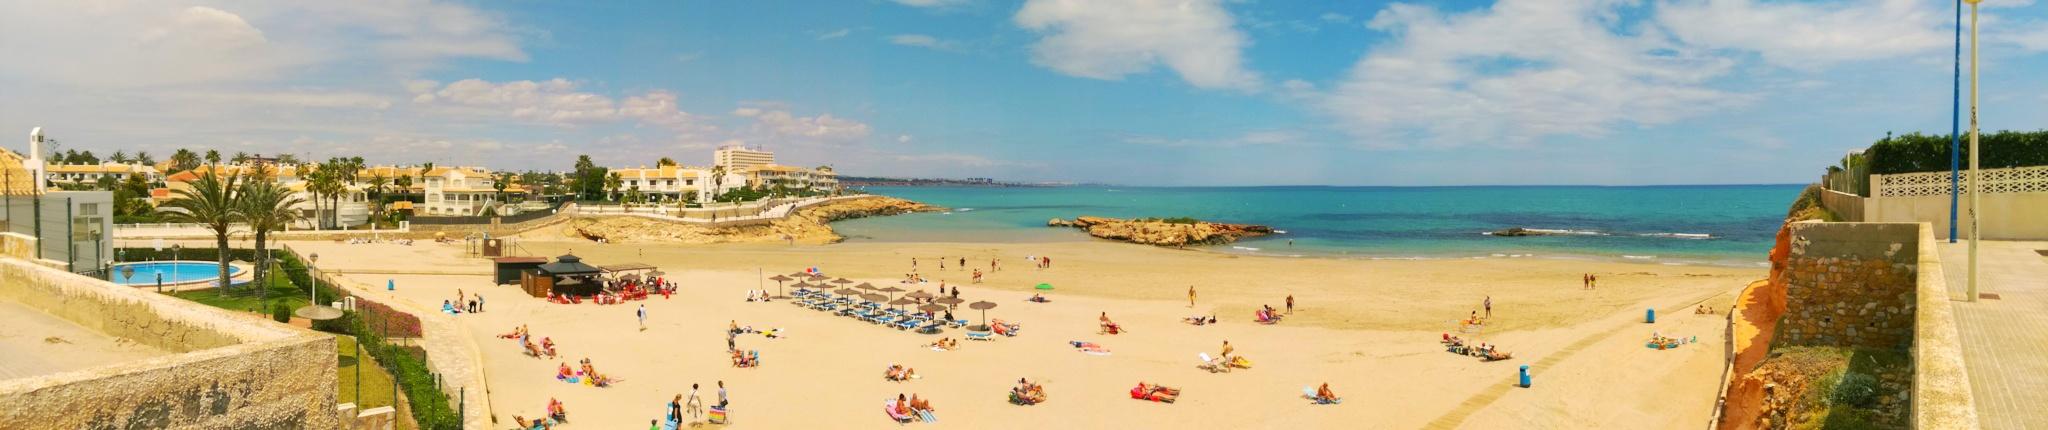 Plaża Capitan